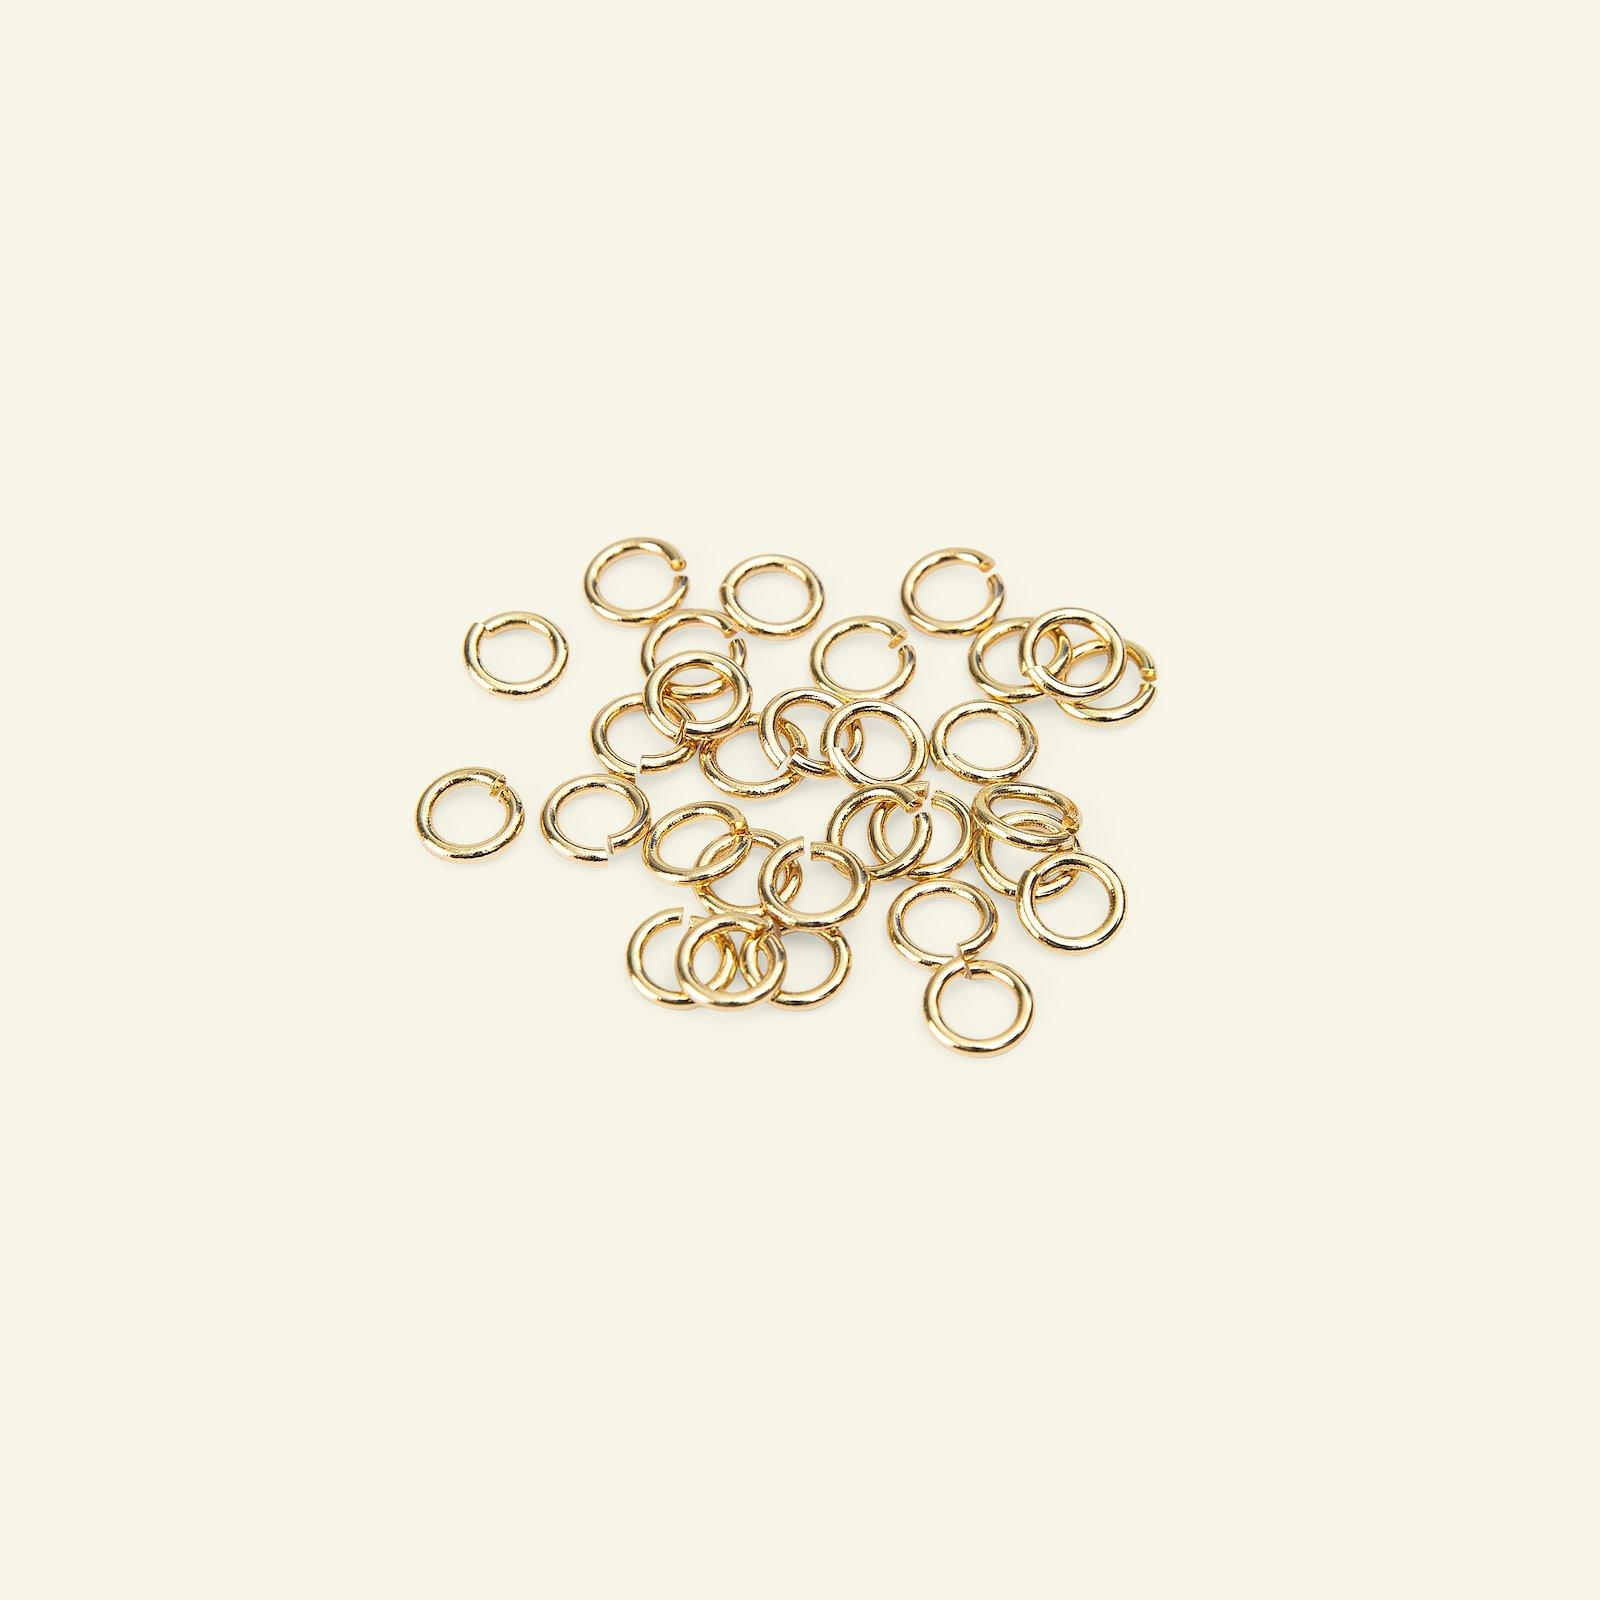 O-ring 7mm/3,5mm gold 30pcs 48500_pack